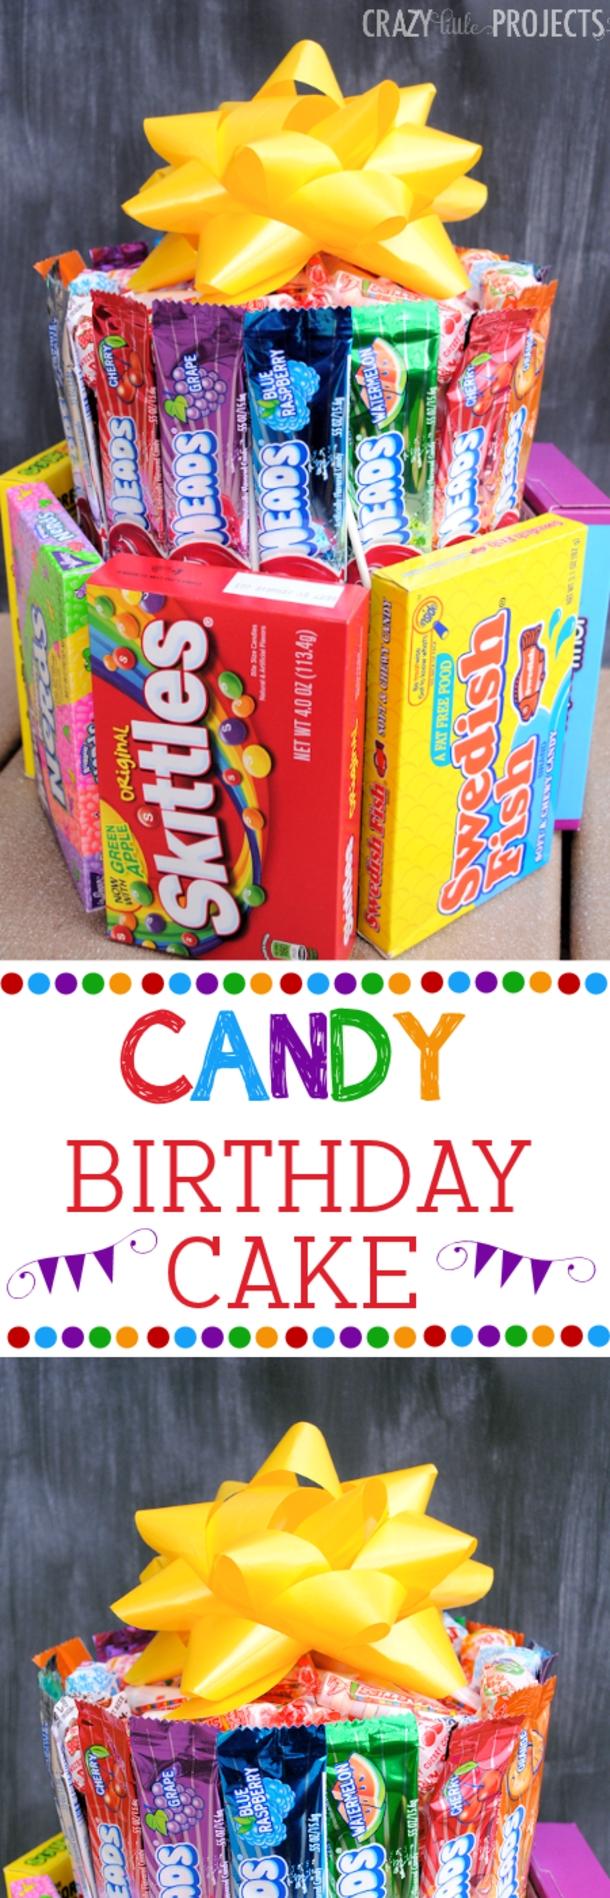 10 Ideal 16Th Birthday Gift Ideas For Boys 10 diy gifts for a girls sweet 16 sweet 16 sweet 16 gifts and gift 7